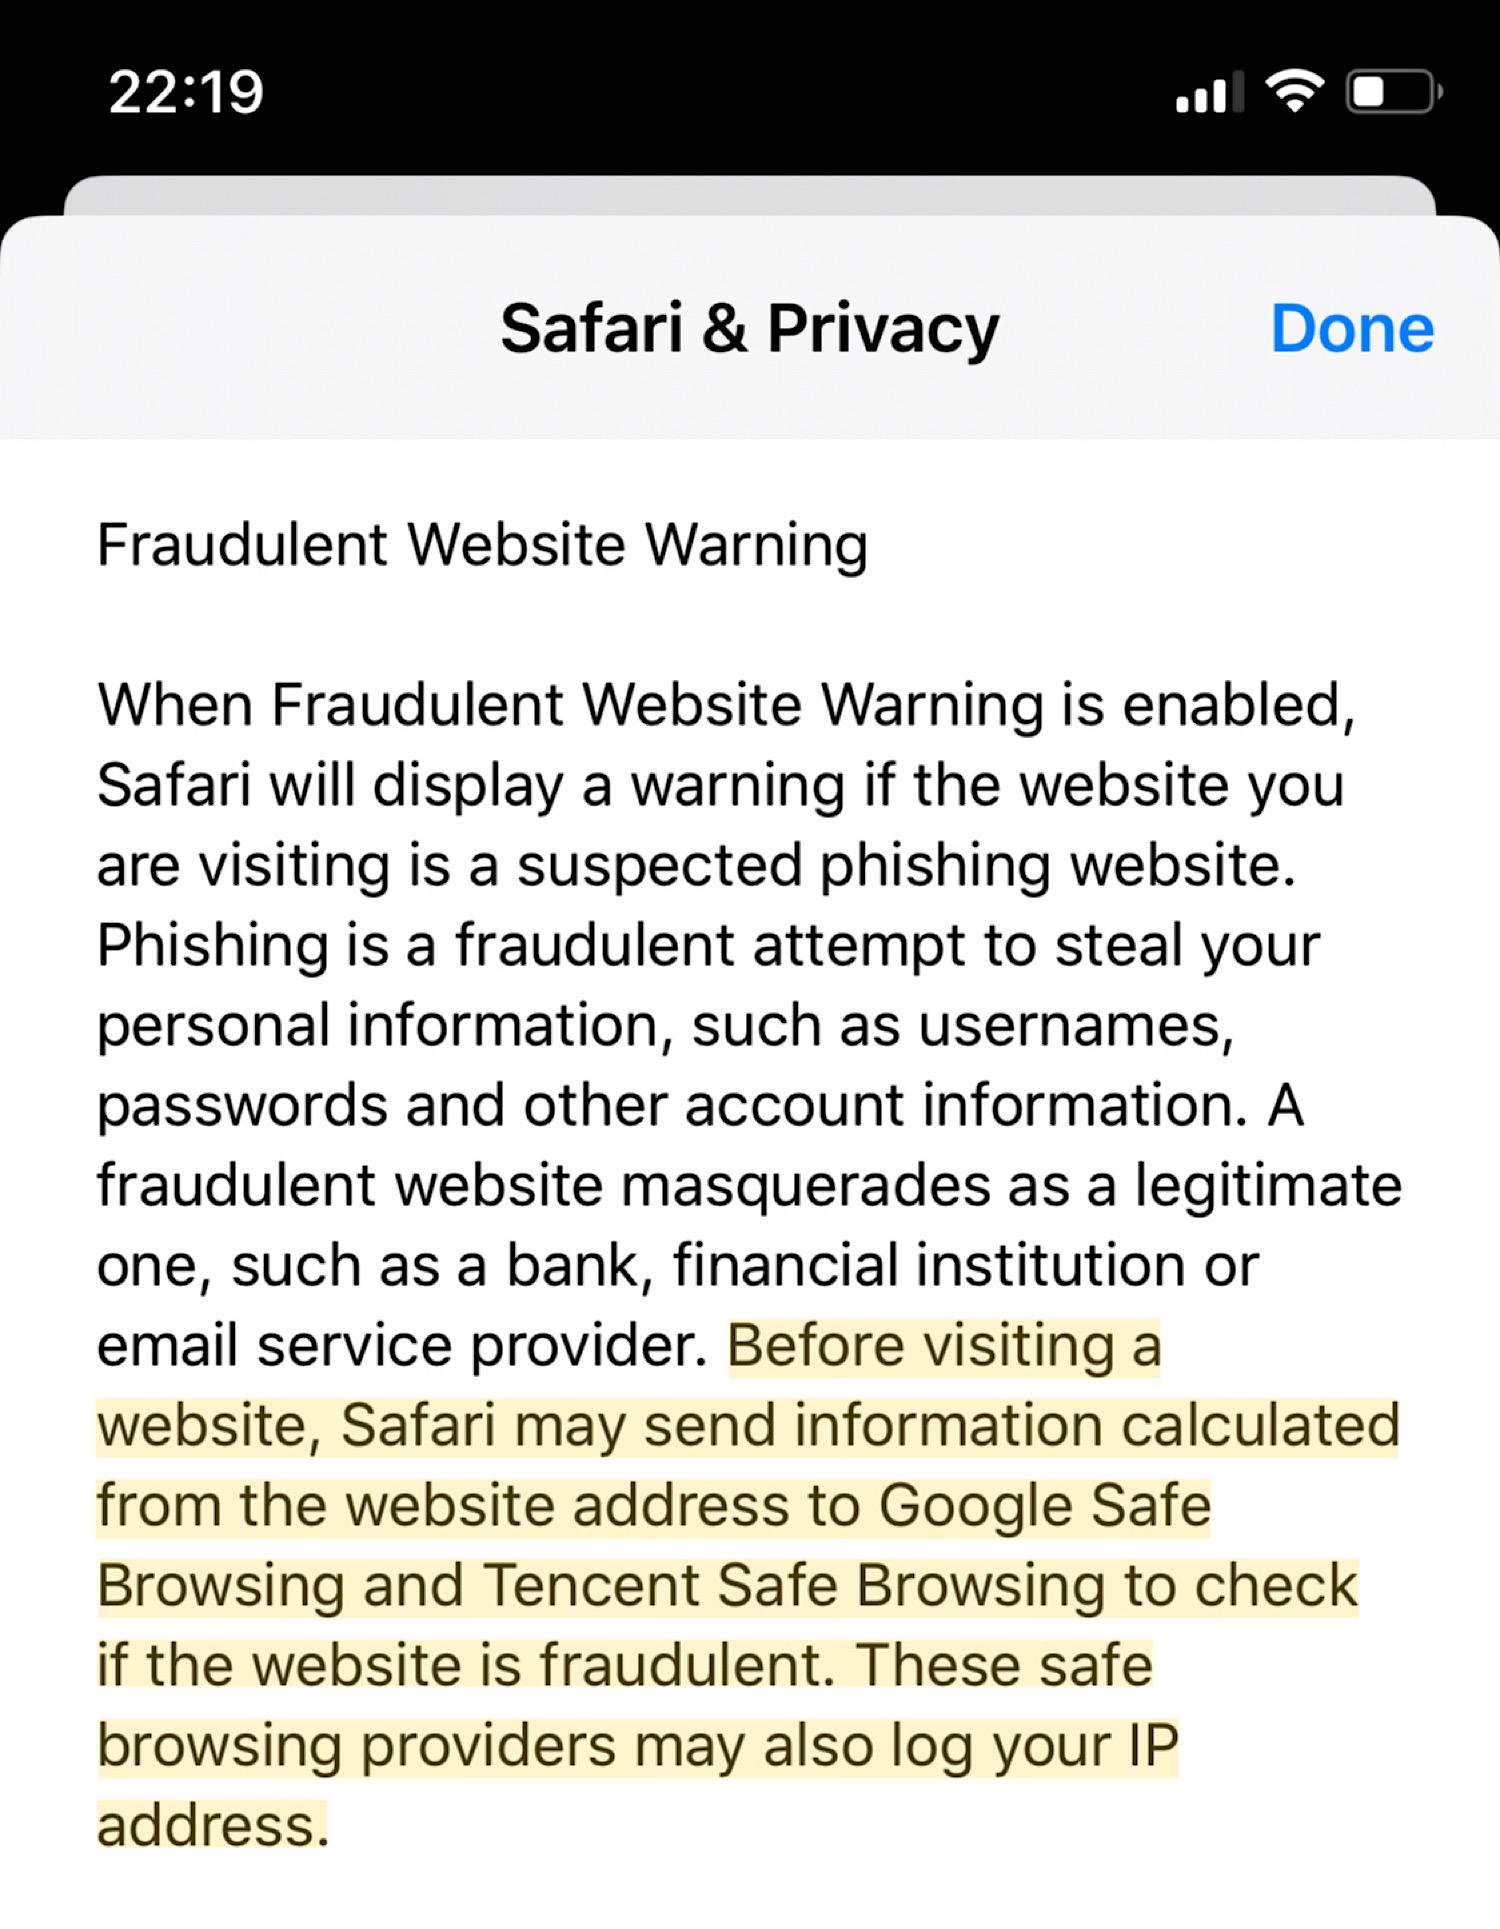 Apple's Safari & Privacy documentation in the iOS settings app.